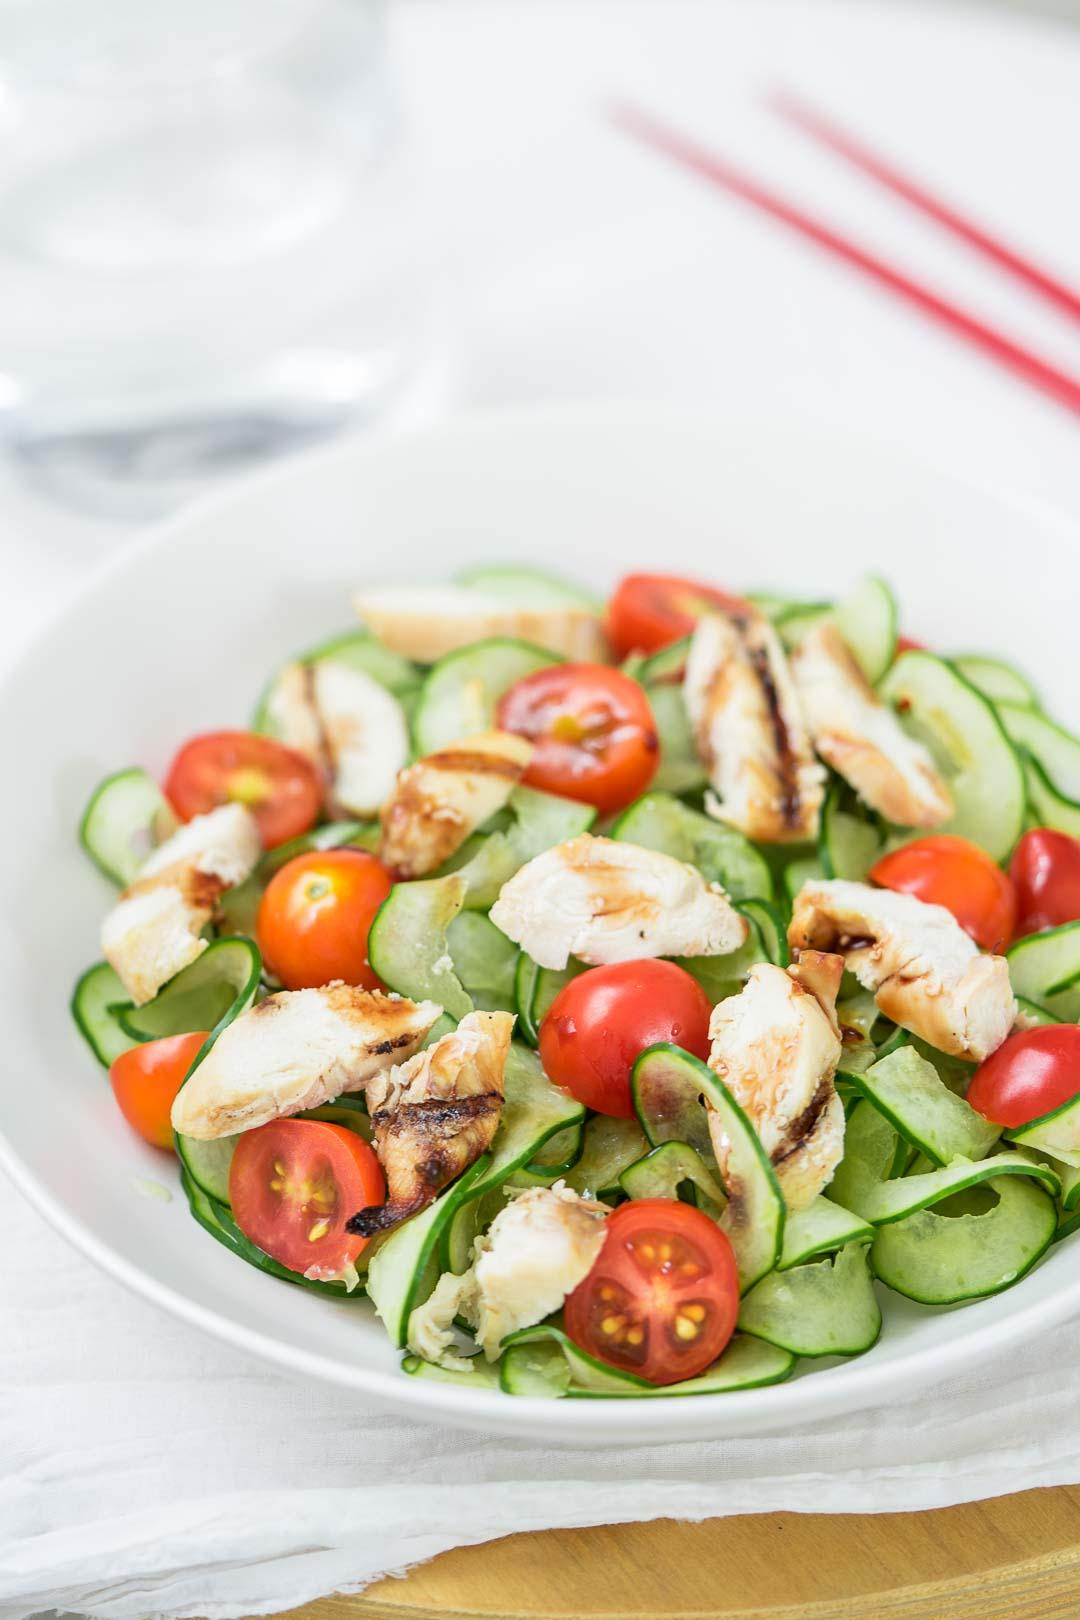 chicken tomato cucumber salad in a white dish